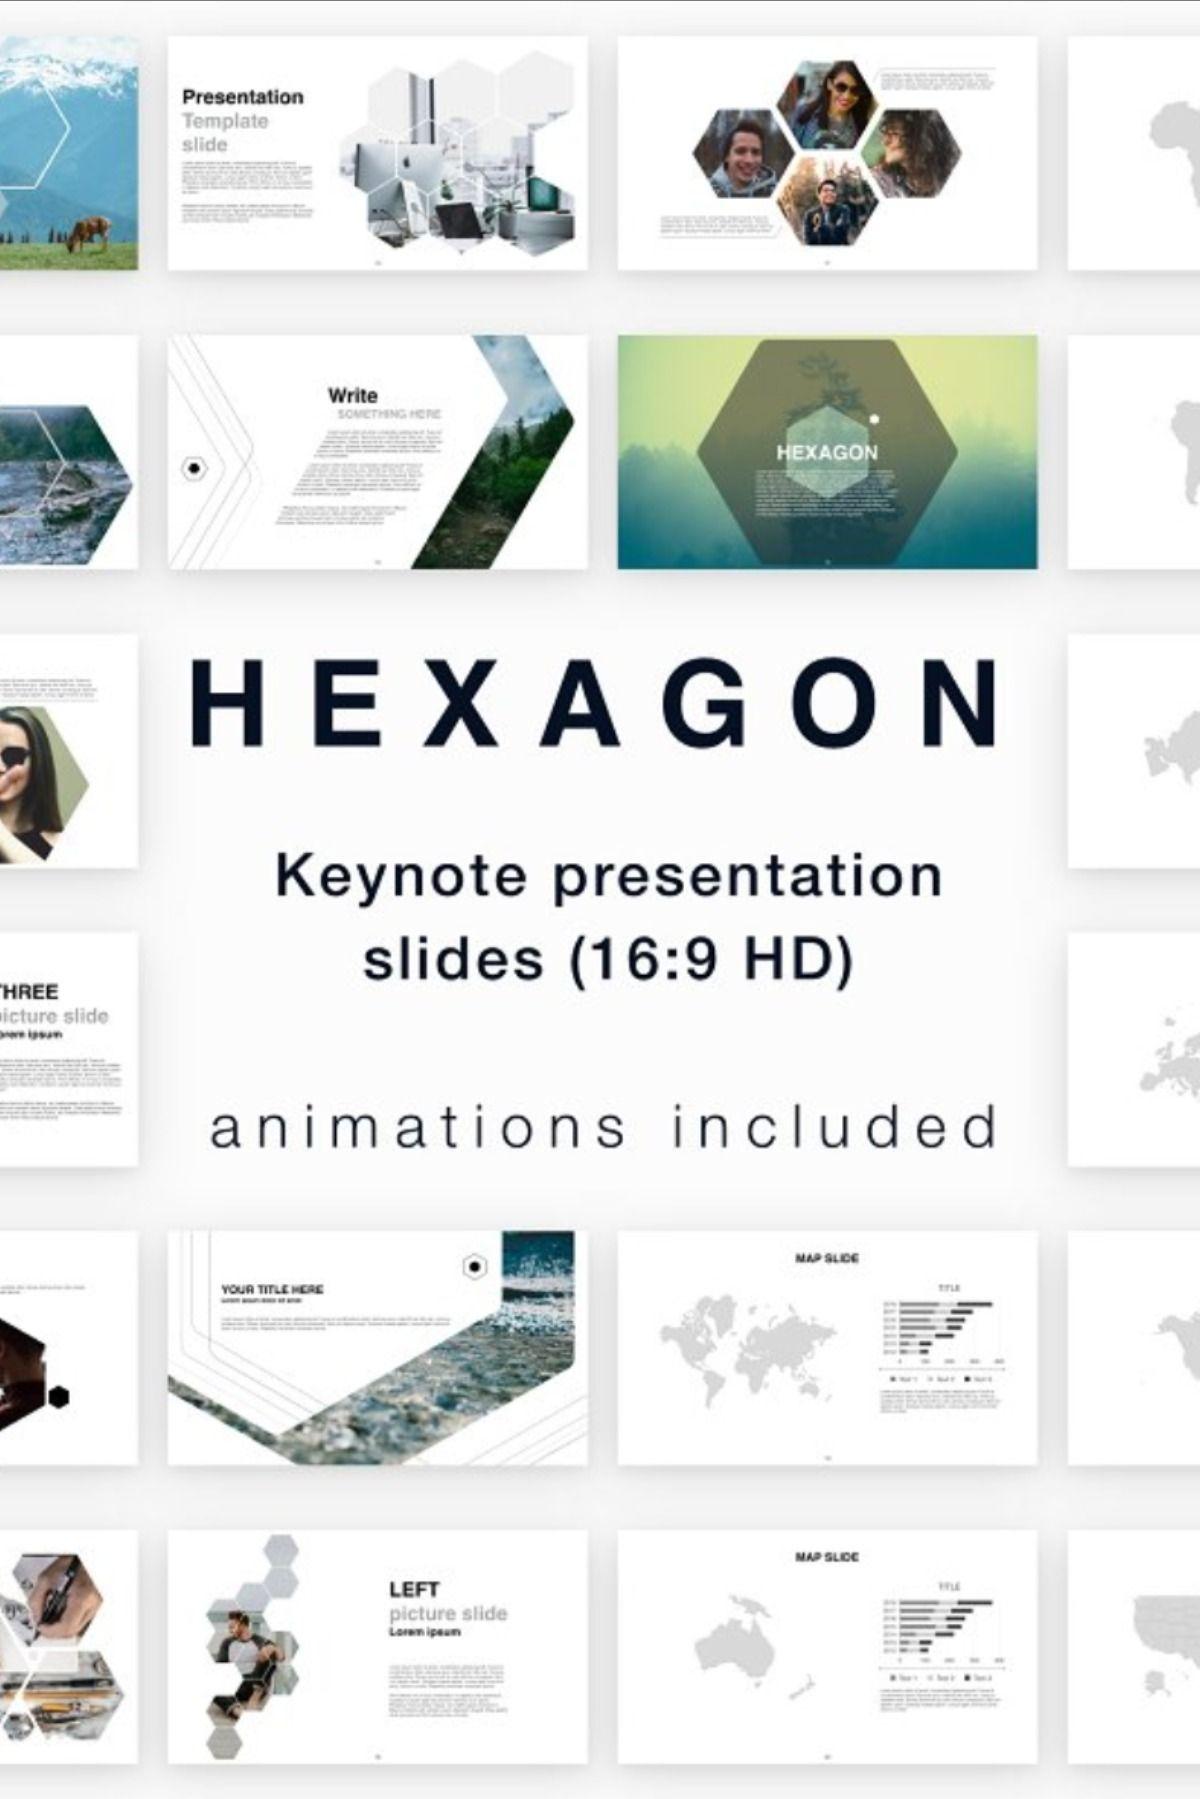 Hexagon in 2020 Presentation slides design, Hexagon